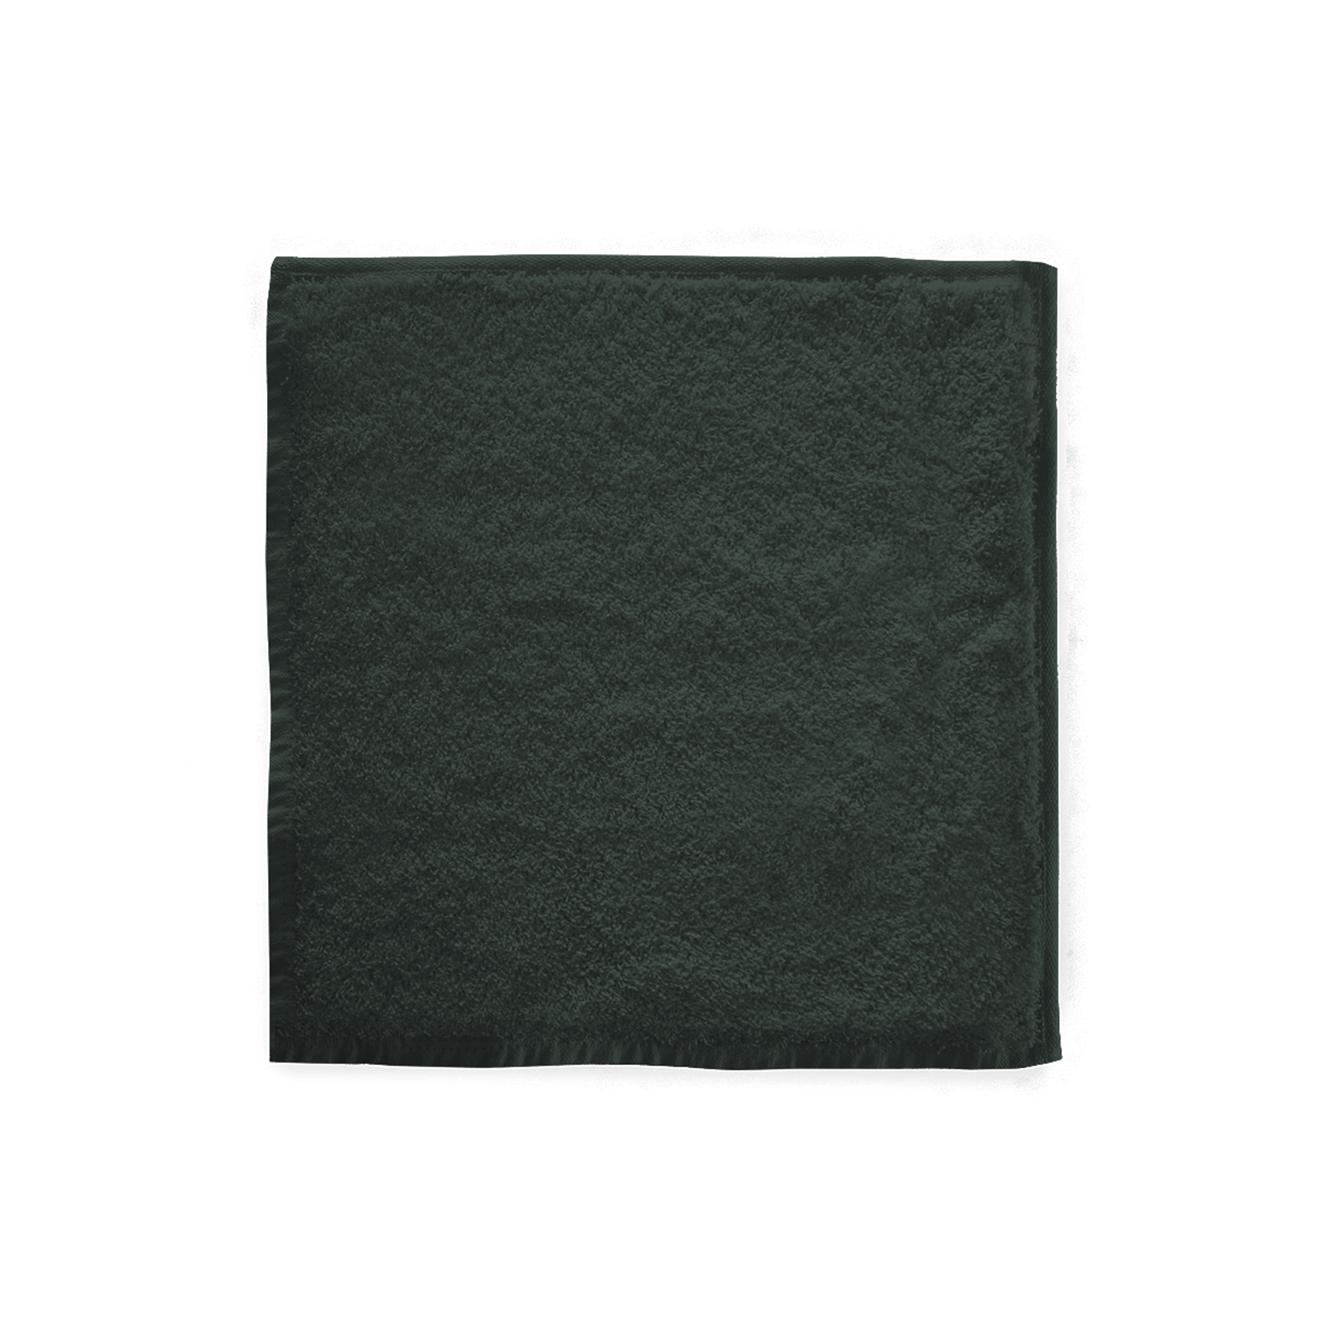 The One Gastendoek 450 gram 30x30 cm Antraciet